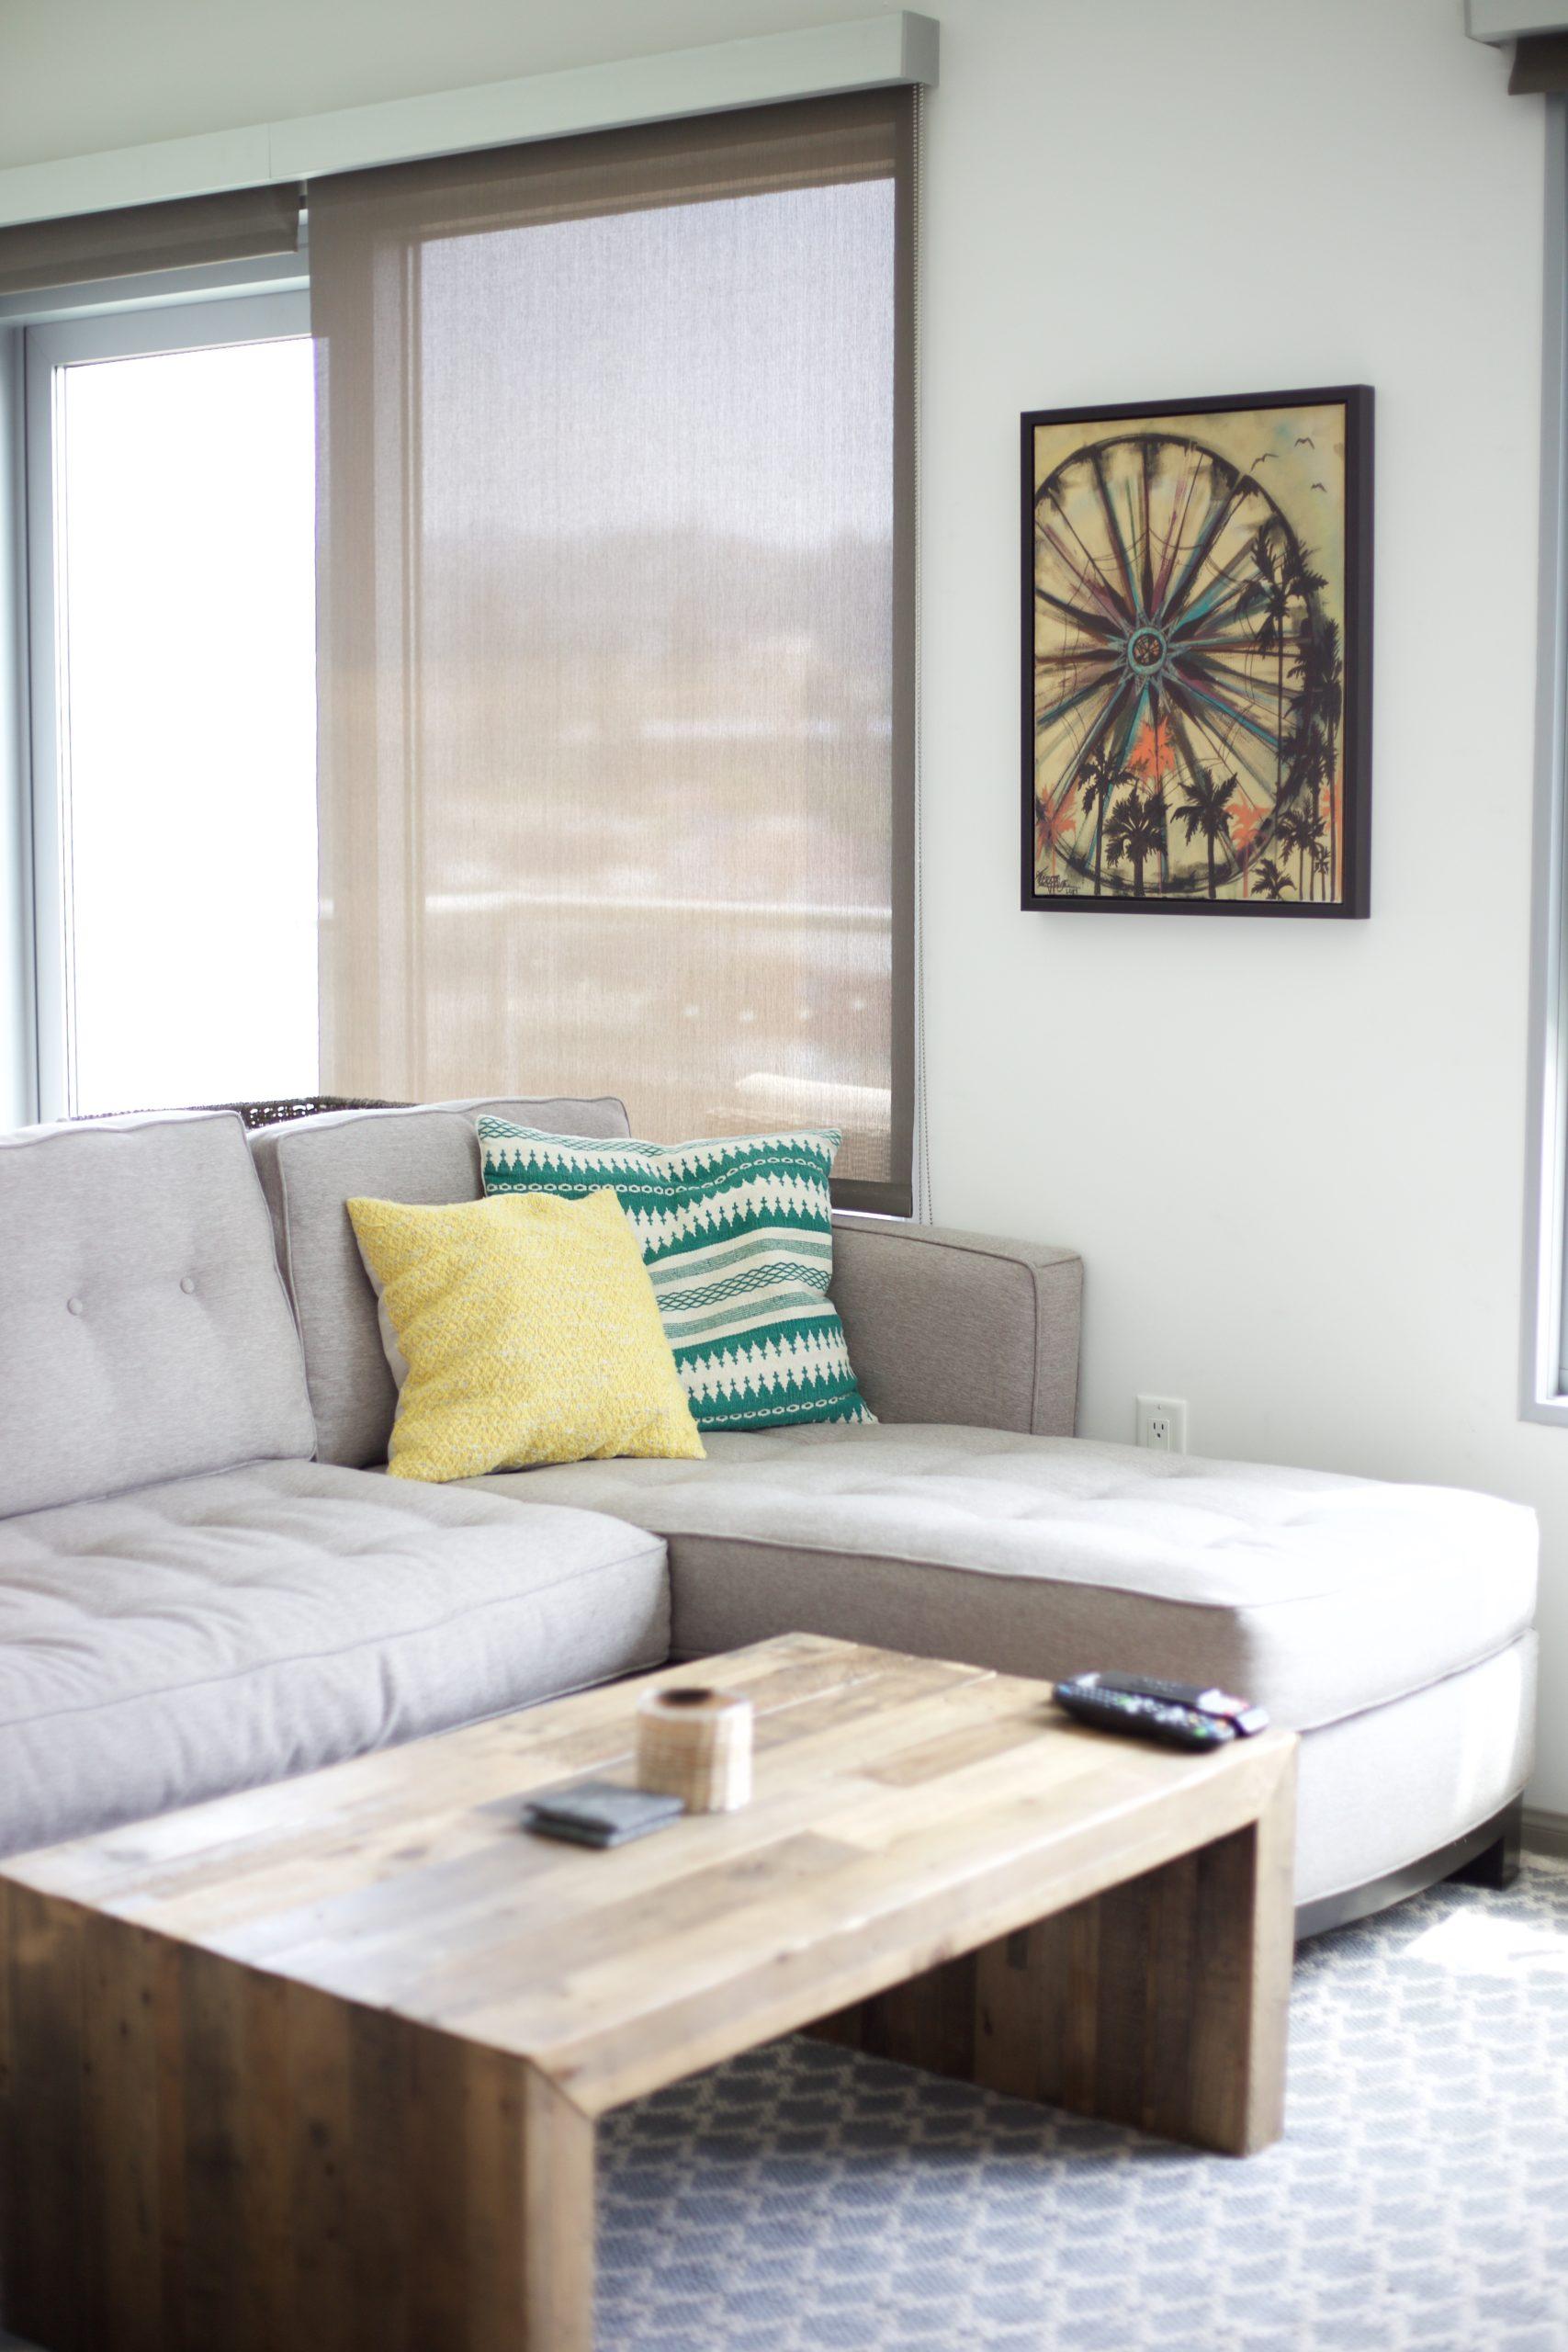 natural light apartment, apartment decor, hollywood apartments, amanda pamblanco, los angeles apartments, luxury apartments, interior design, sunset and vine apartments